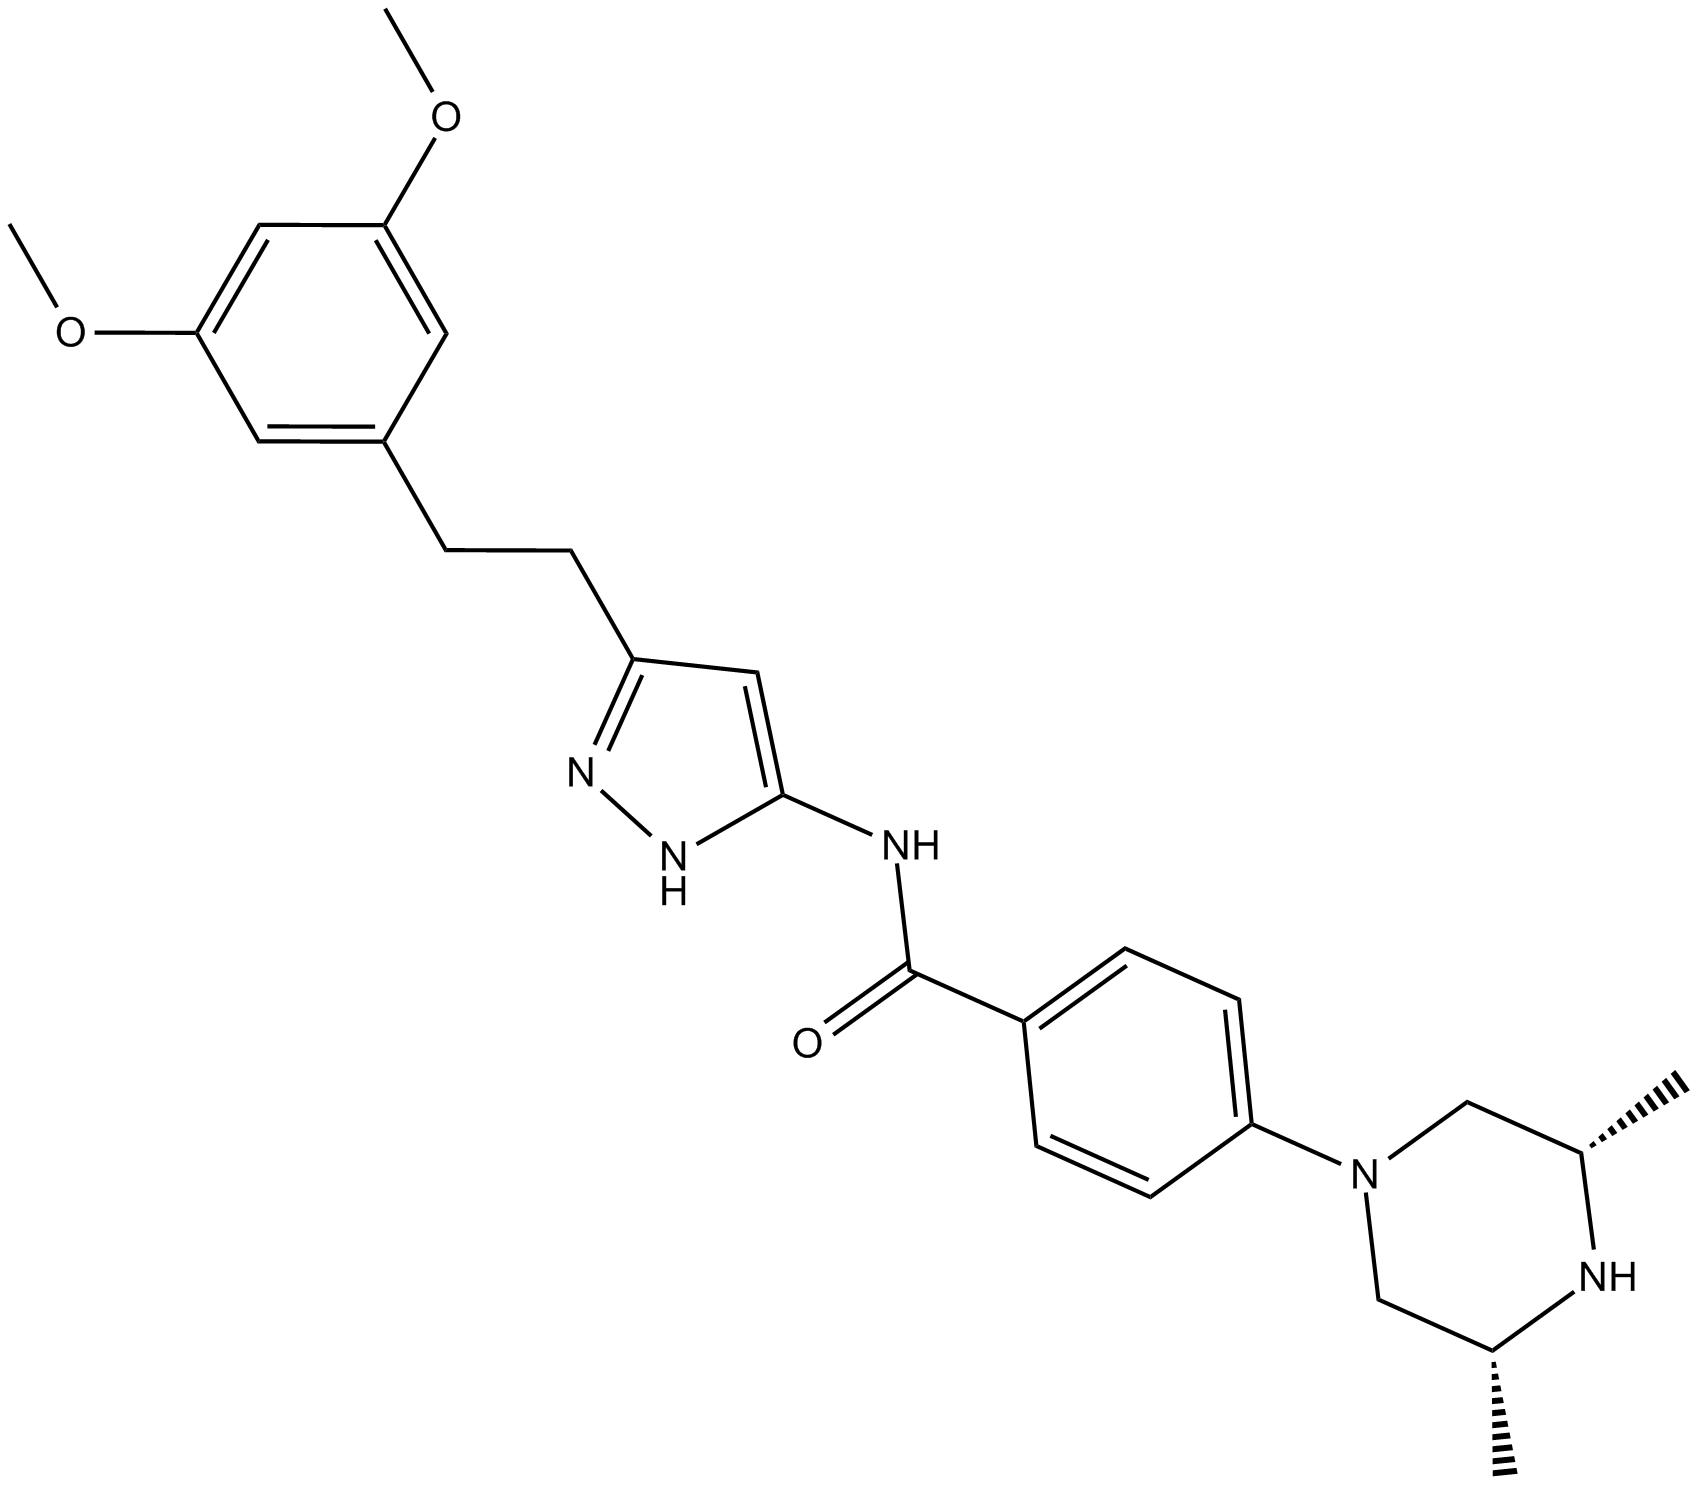 AZD4547